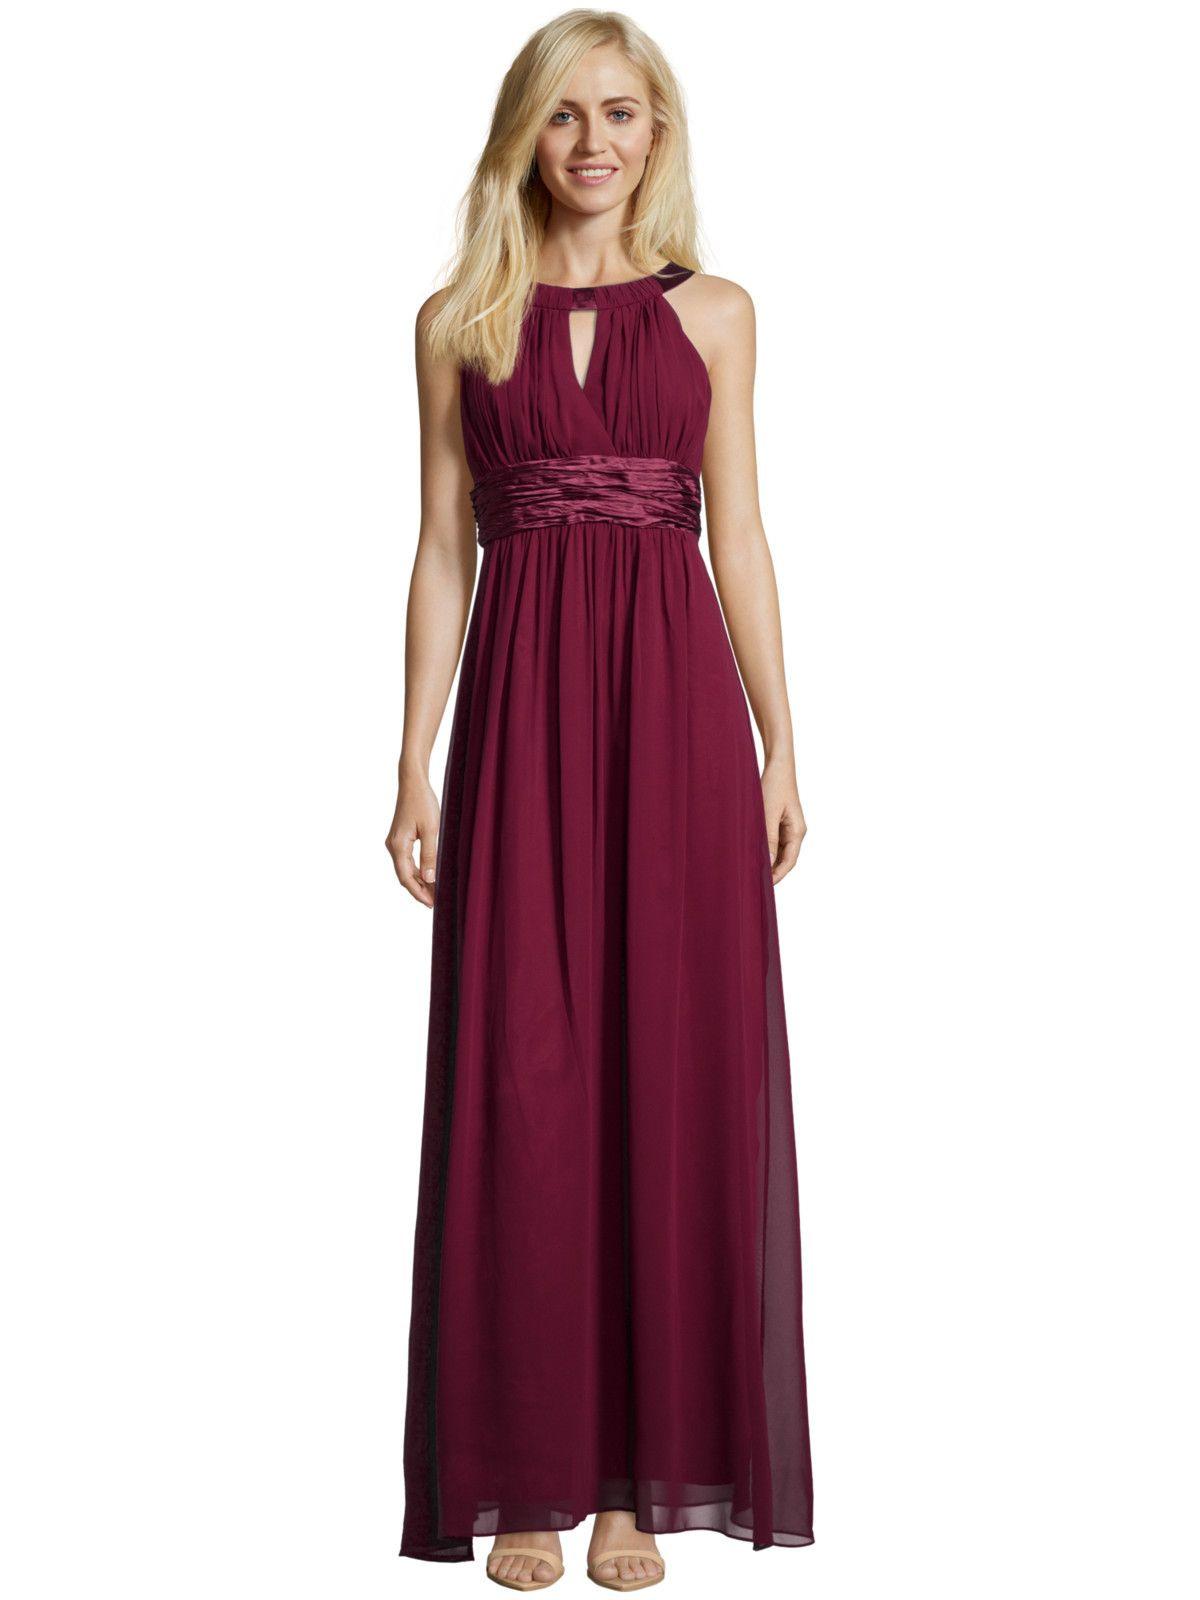 Elegant Jakes Abendkleid für 2019Abend Luxurius Jakes Abendkleid Boutique